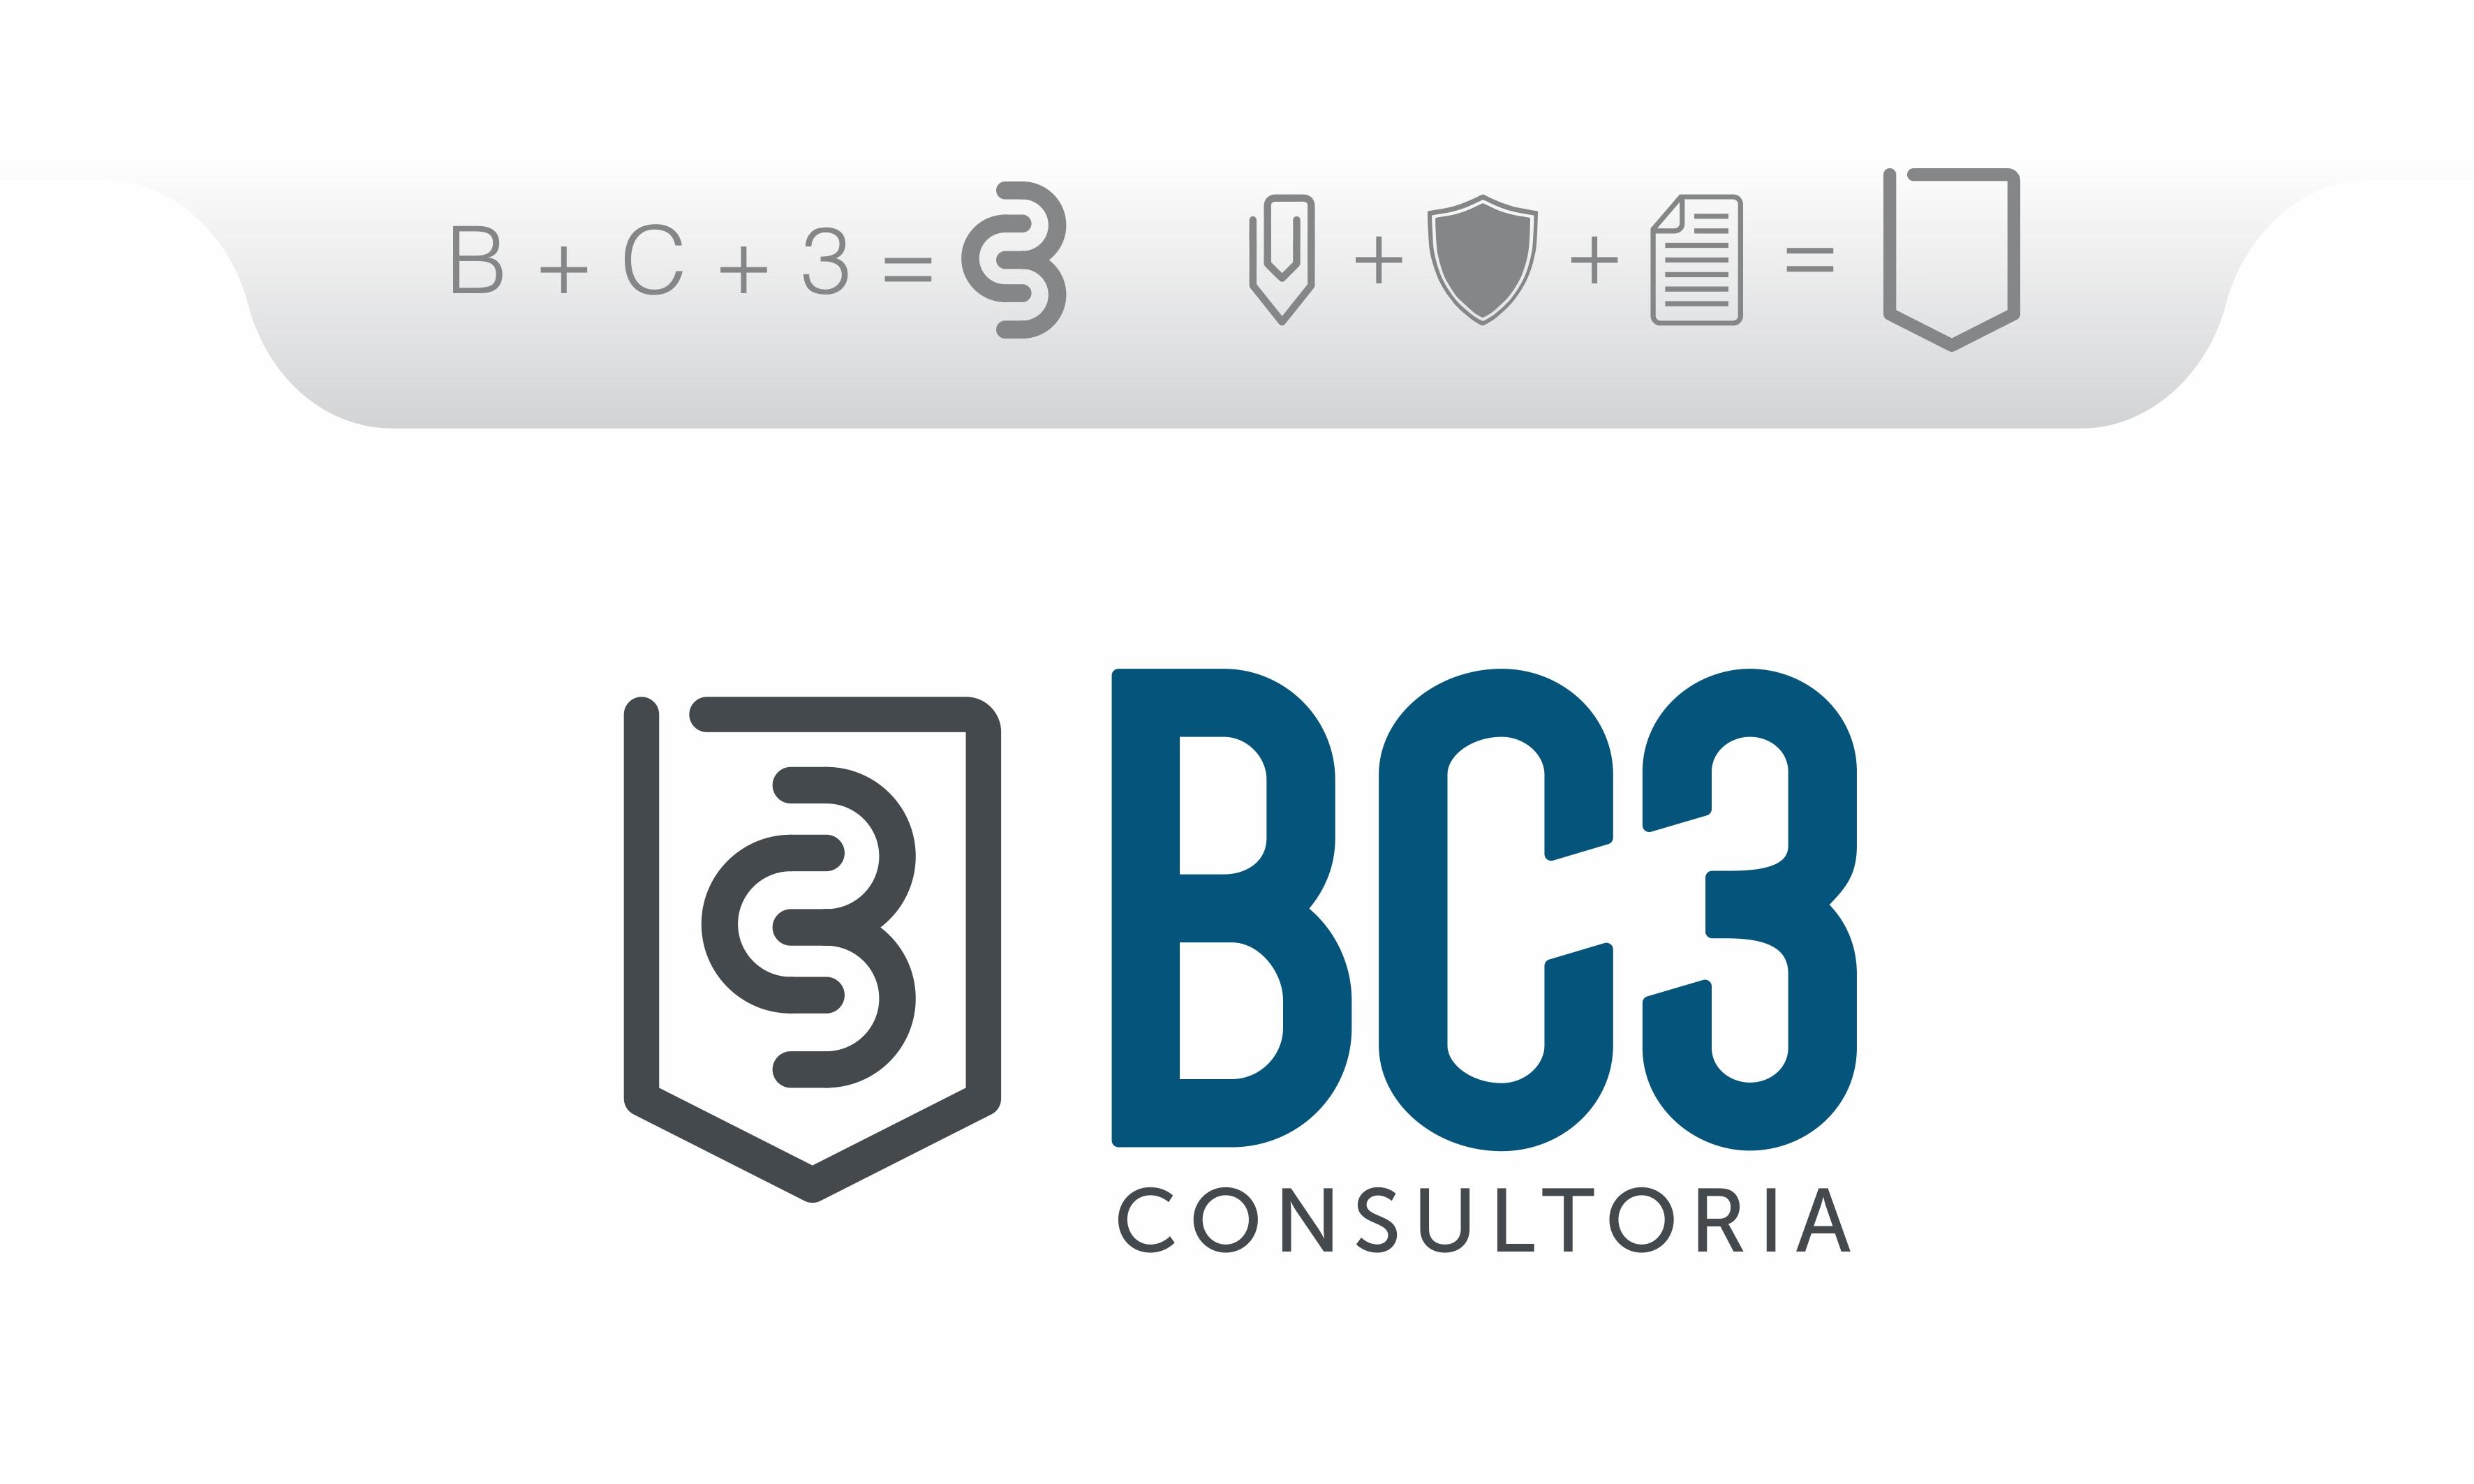 tempero_bc3-consultoria_02